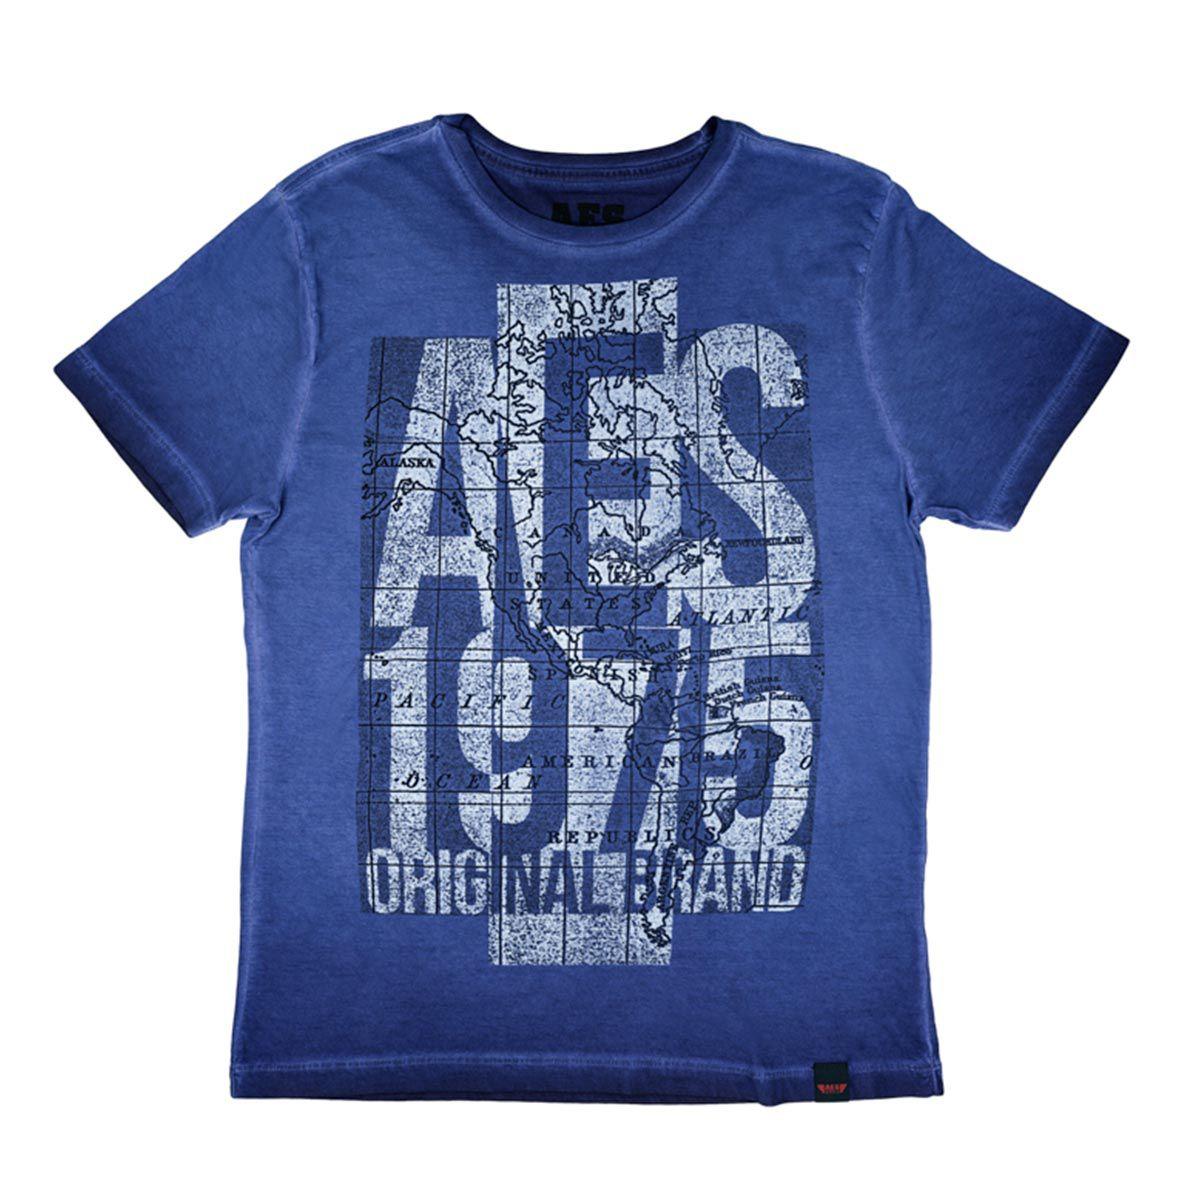 Camiseta AES 1975 Worldwide